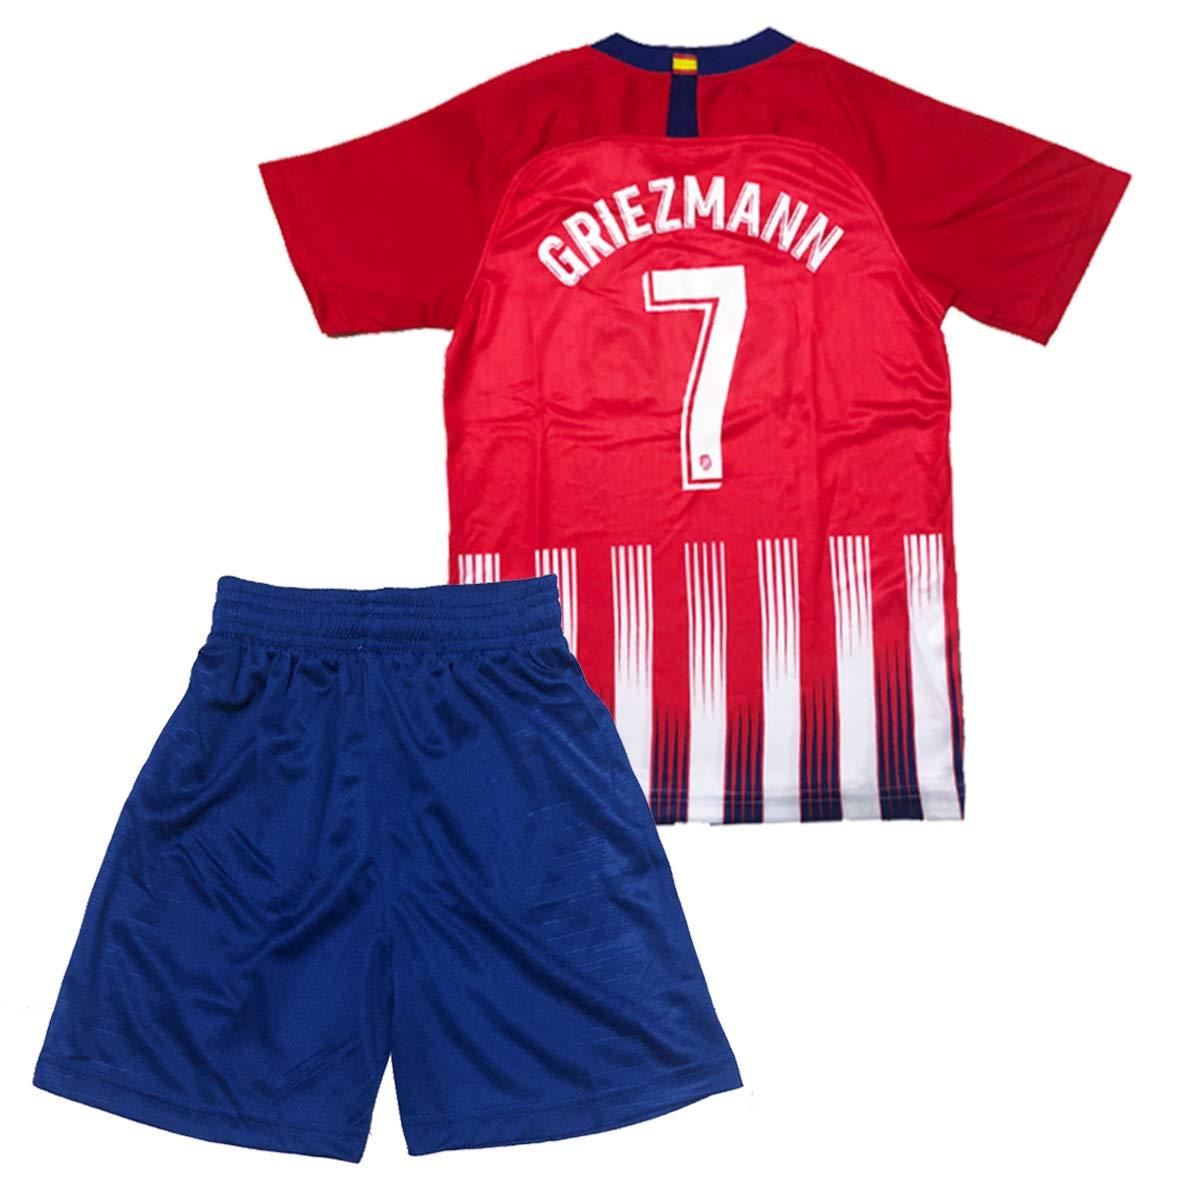 GLL SPORT #7 Griezmann New 2018/2019 Season Atletico Madrid Home Kids Shirt Soccer Football Jersey & Short & Socks Sport Kit for Youth Kids